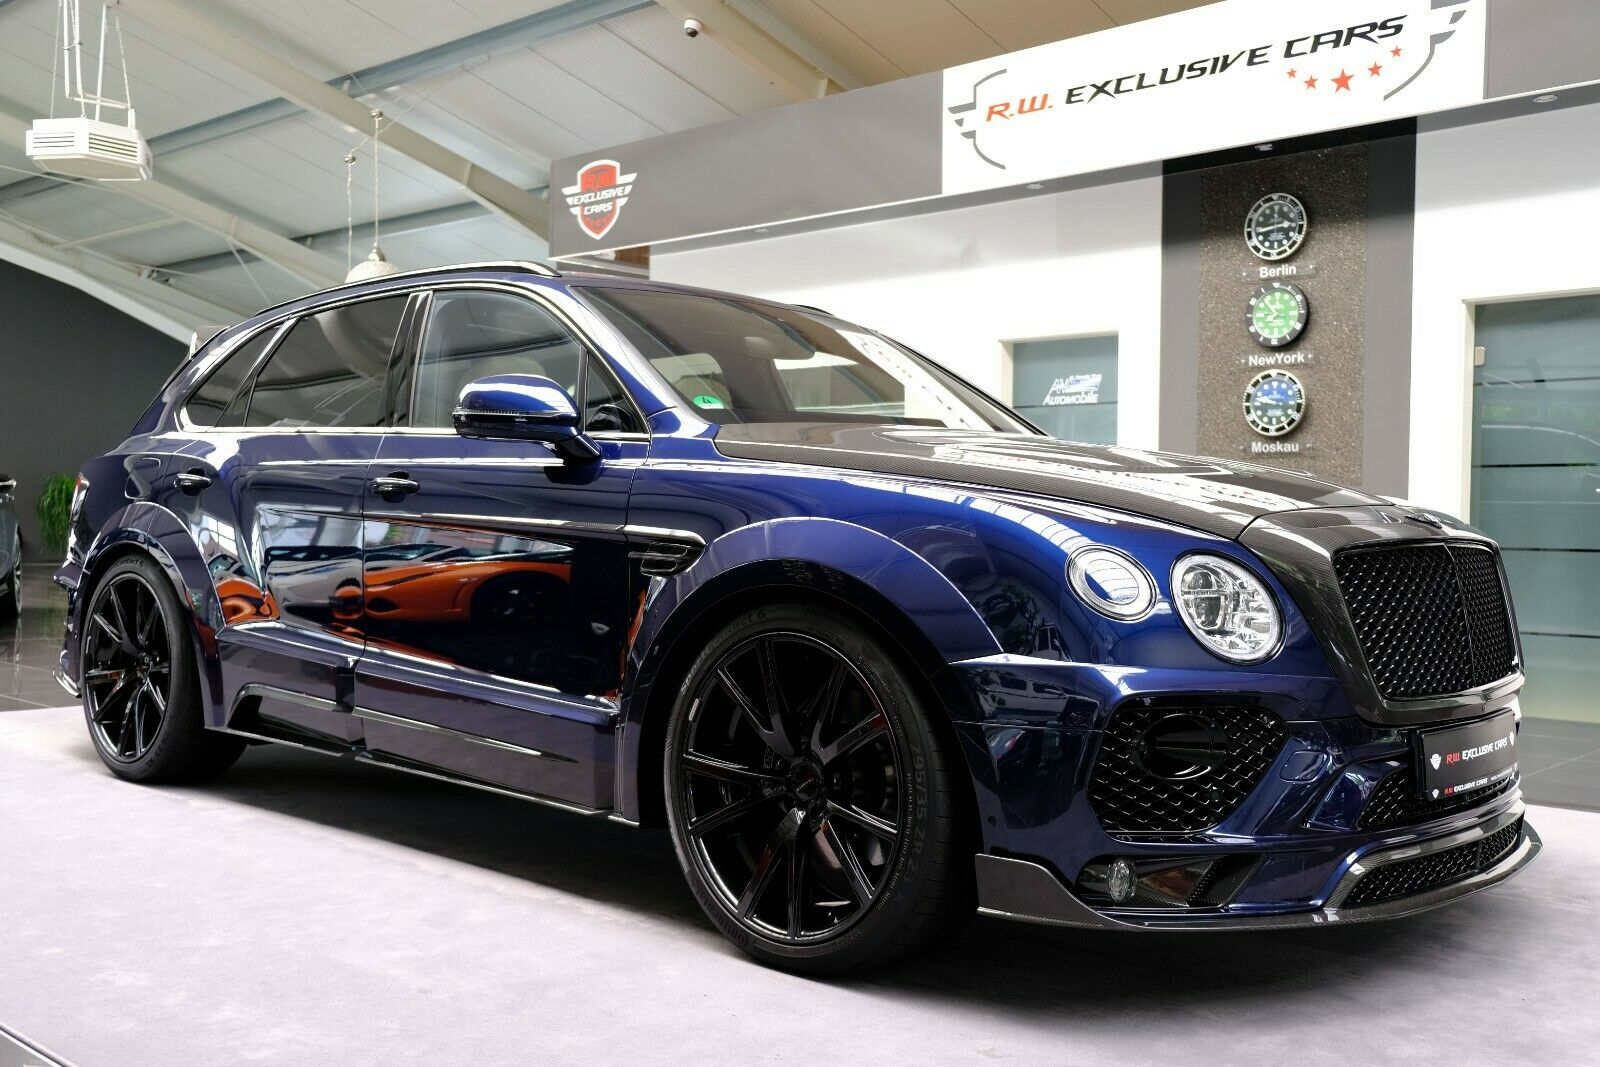 Bentley Bentayga Mansory W Body Mulliner Luxury Pulse Cars Germany For Sale On Luxurypulse